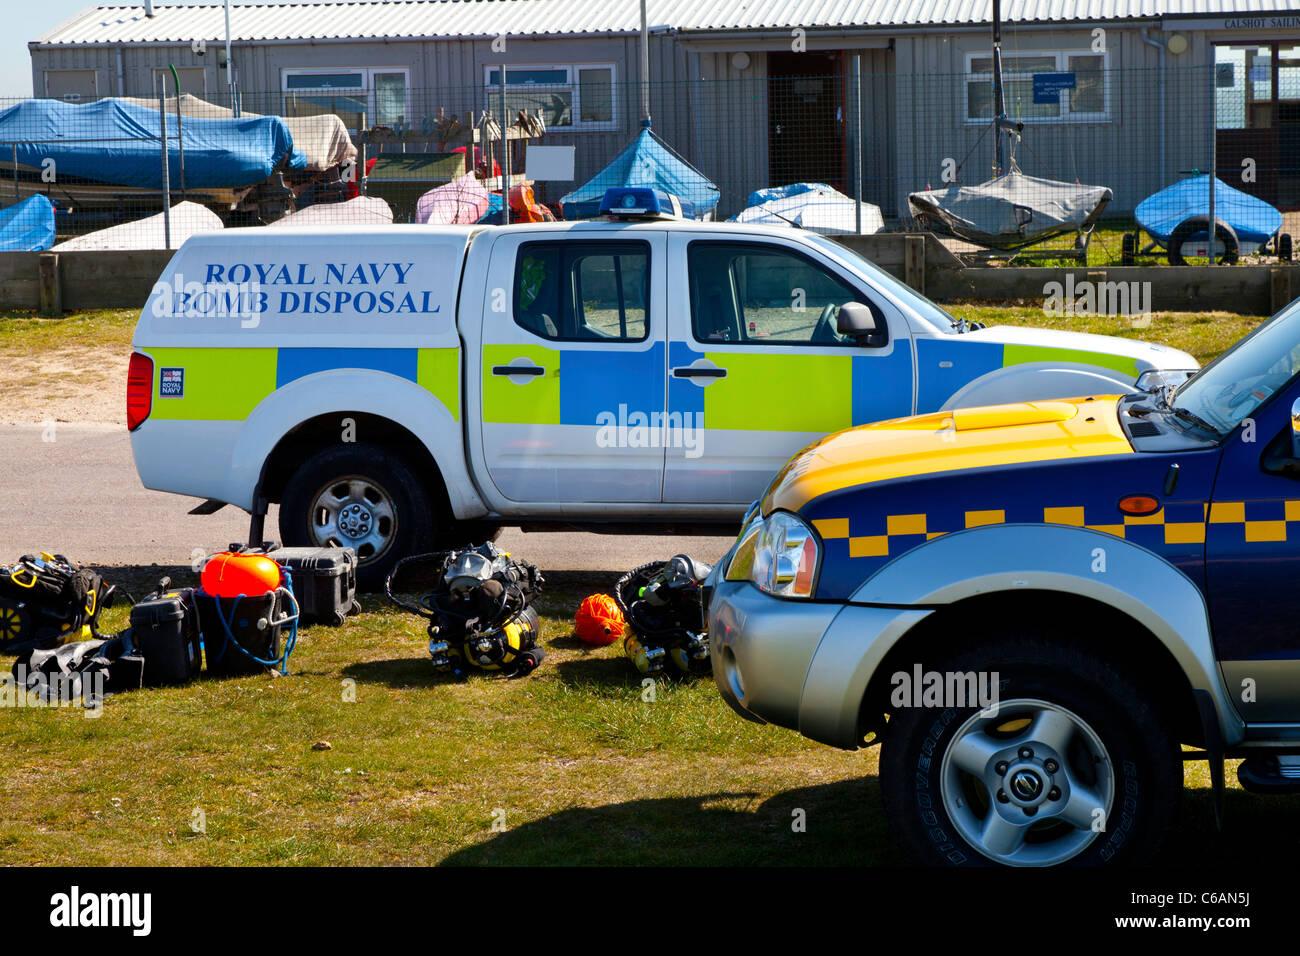 Royal Navy Bomb Disposal HM coastguard vehicle van emergency response diffuse make safe blow up professional army - Stock Image